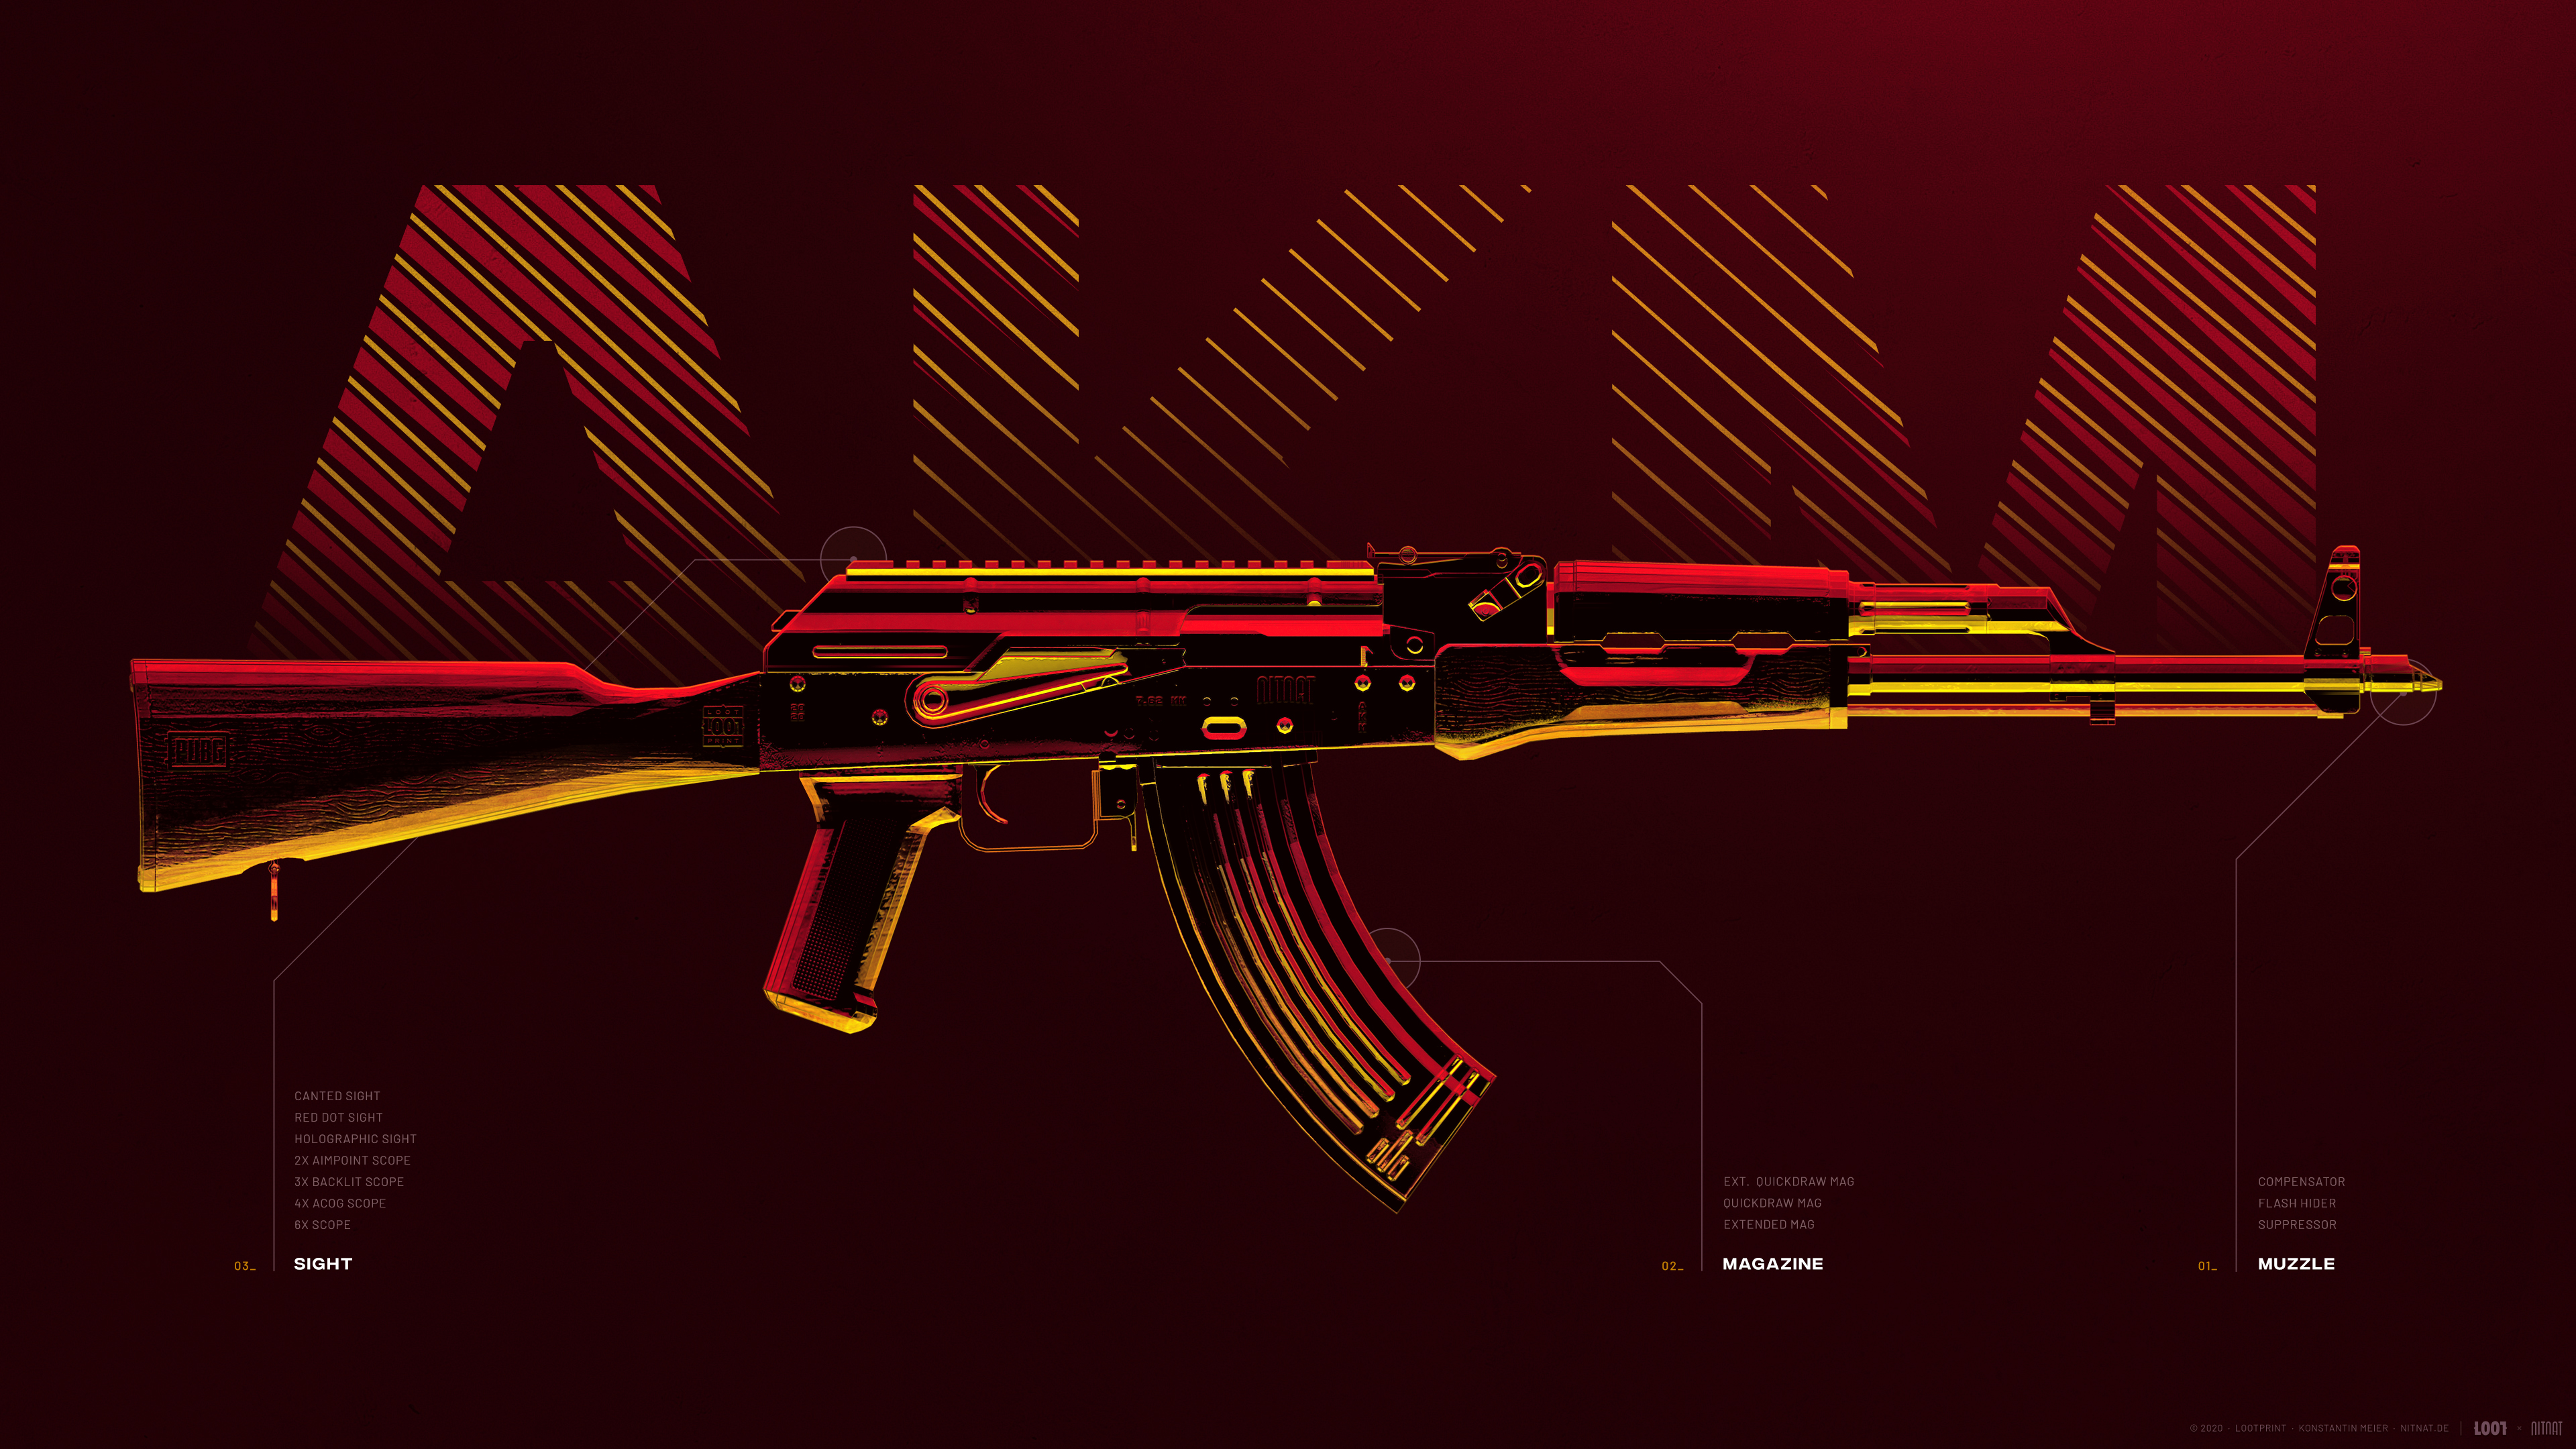 Fondos de pantalla Arma AKM de PUBG